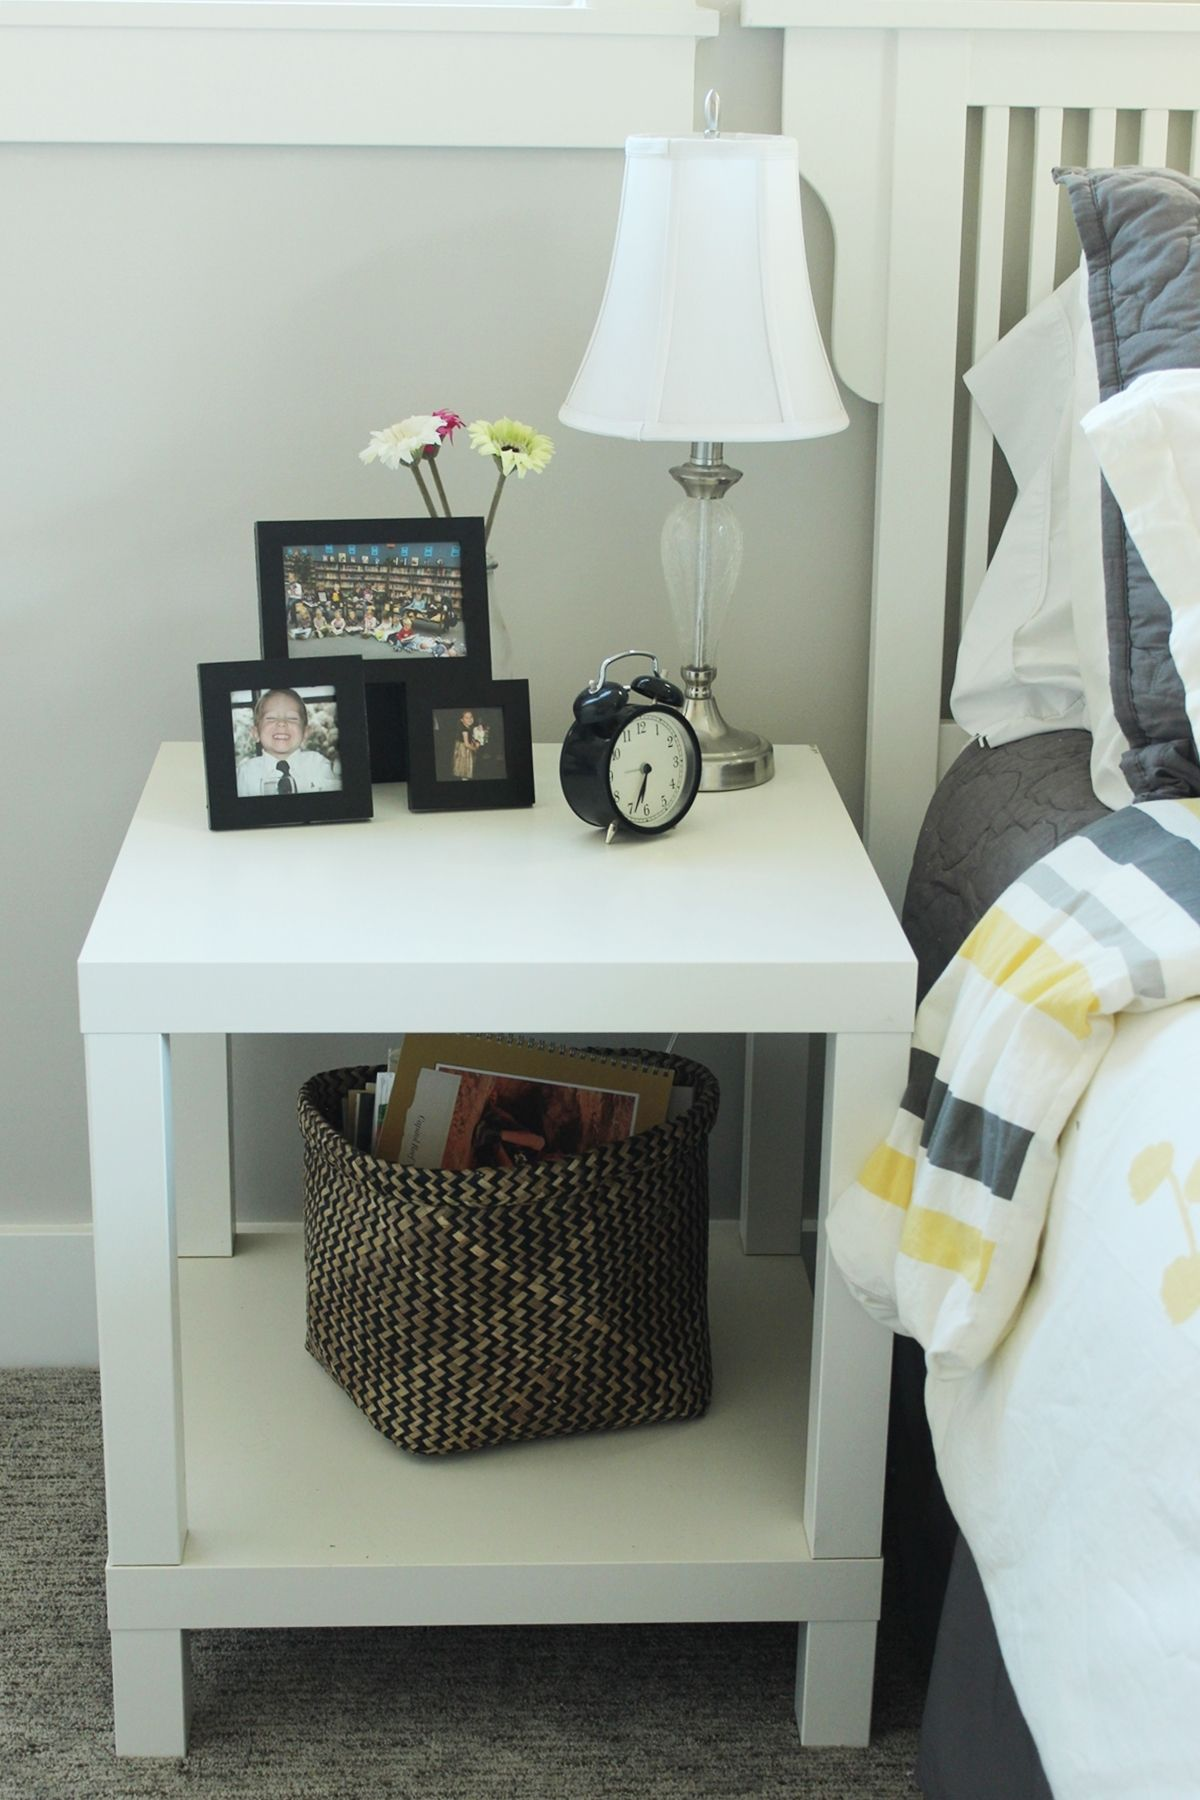 Guest Bedroom Nighstand Decor